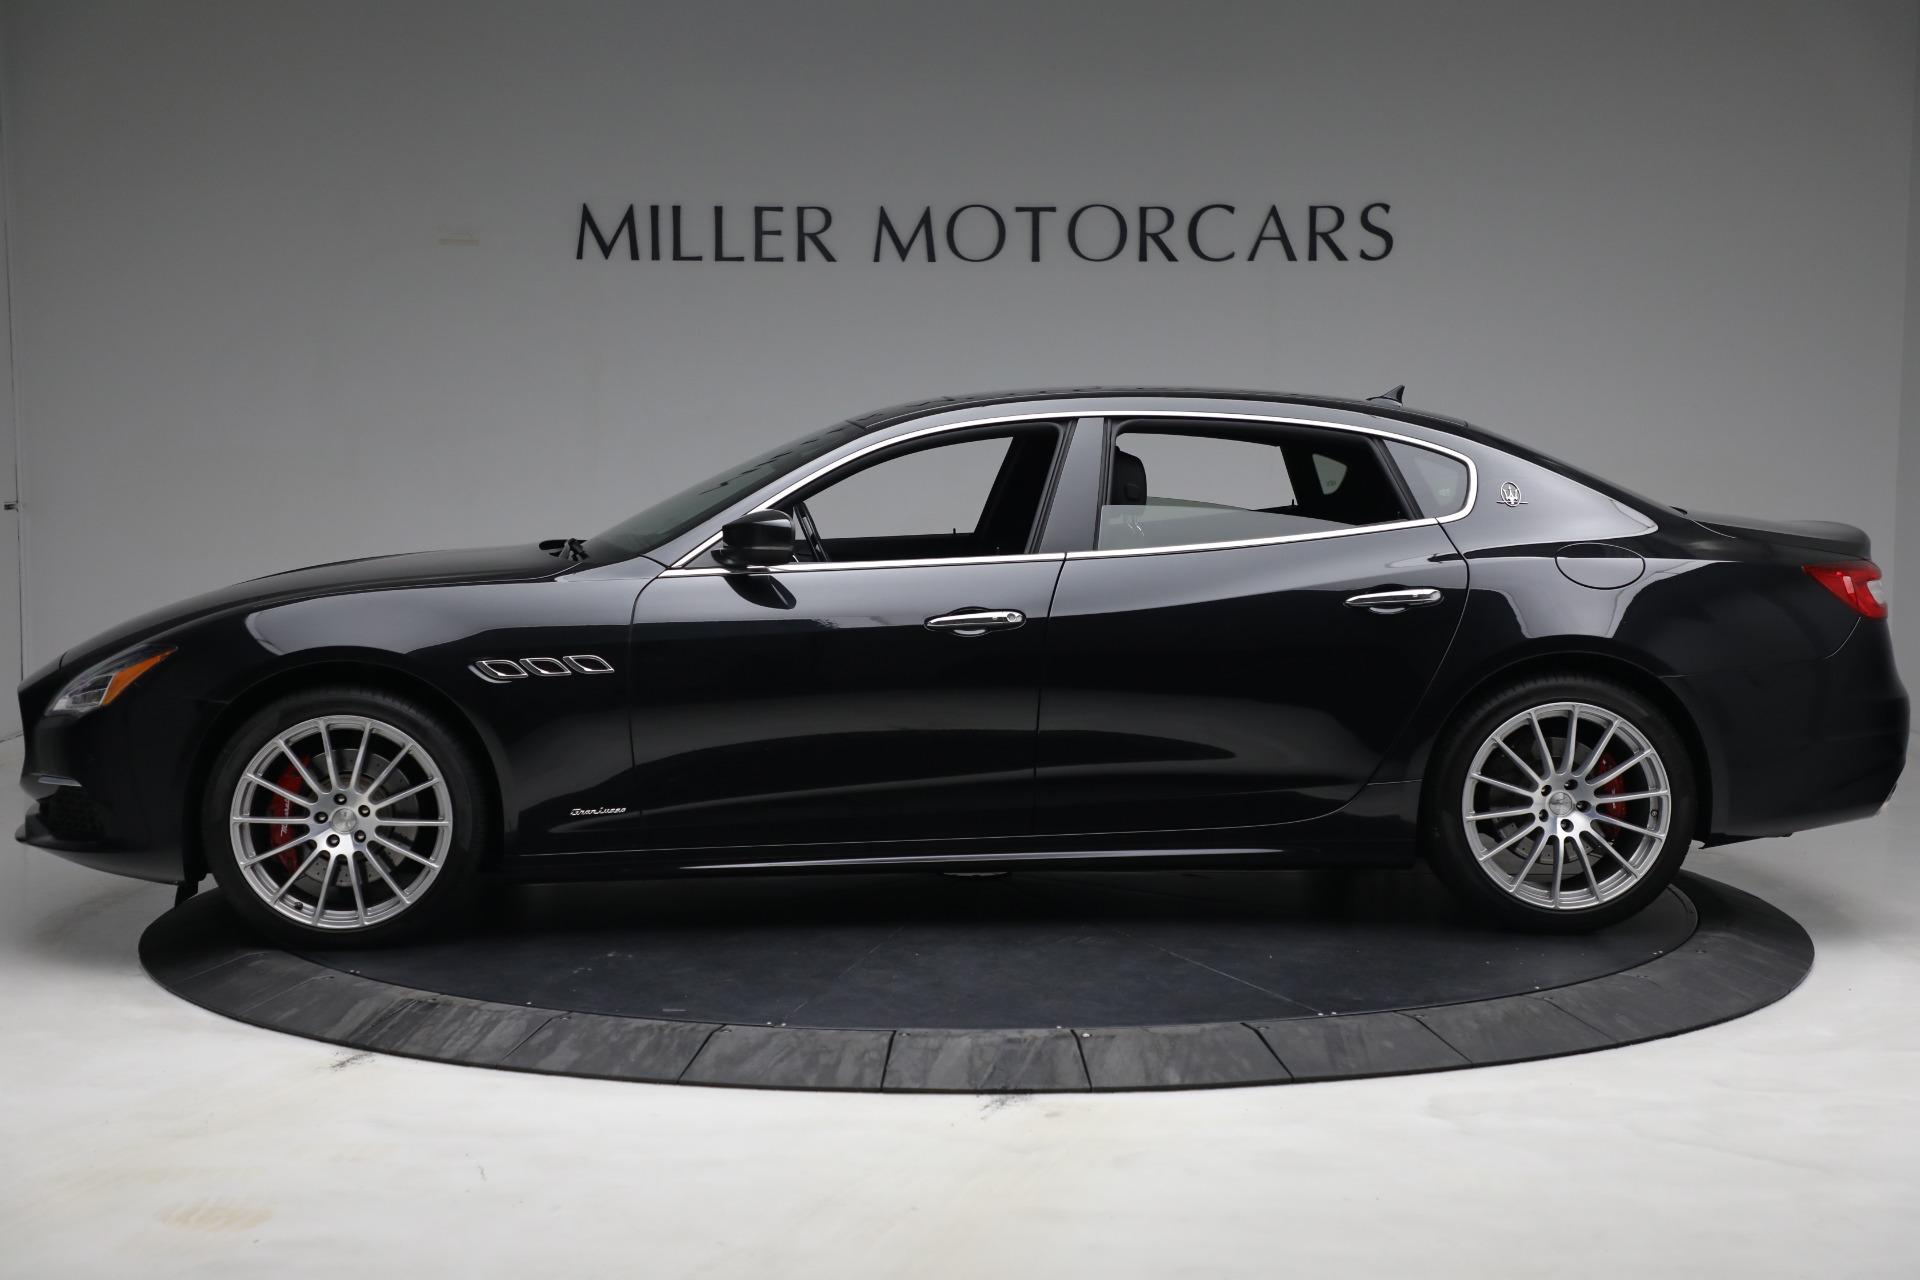 New-2019-Maserati-Quattroporte-S-Q4-GranLusso